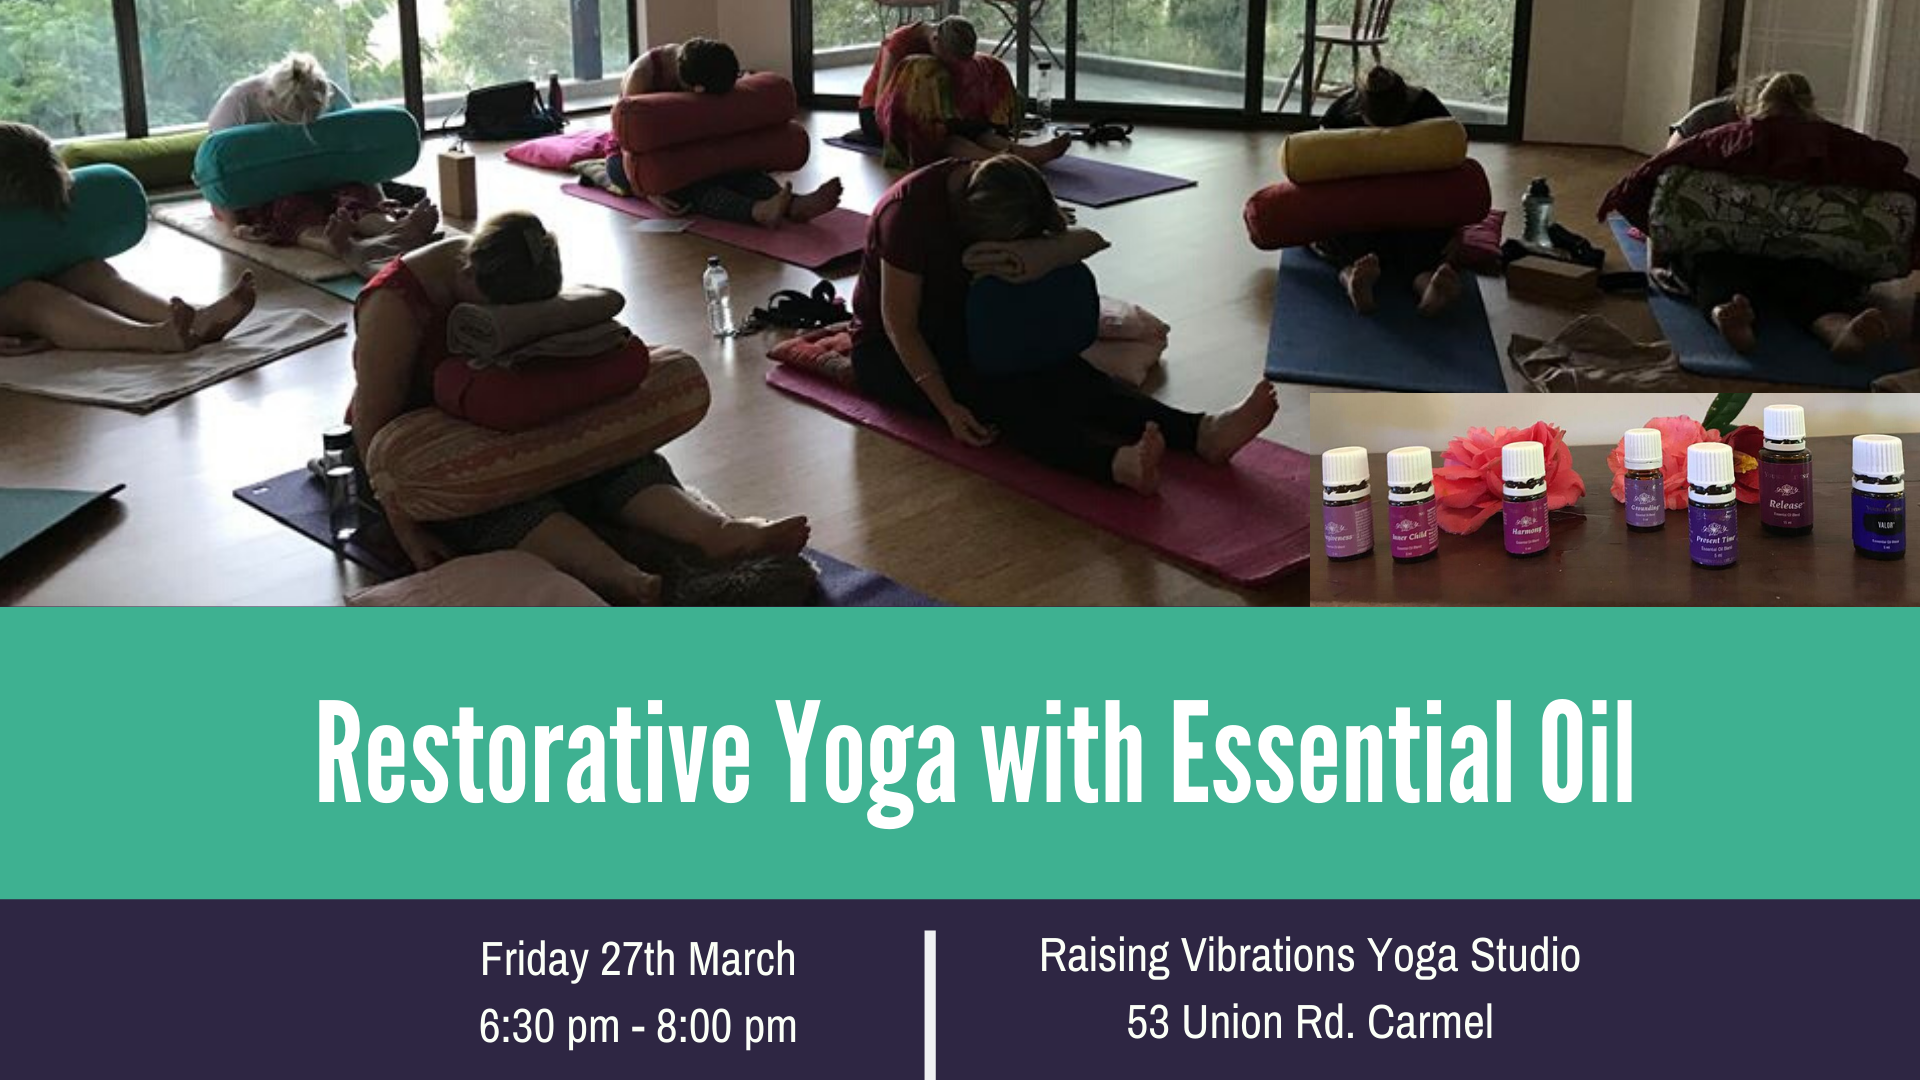 Restorative Yoga With Essential Oil 27 Mar 2020